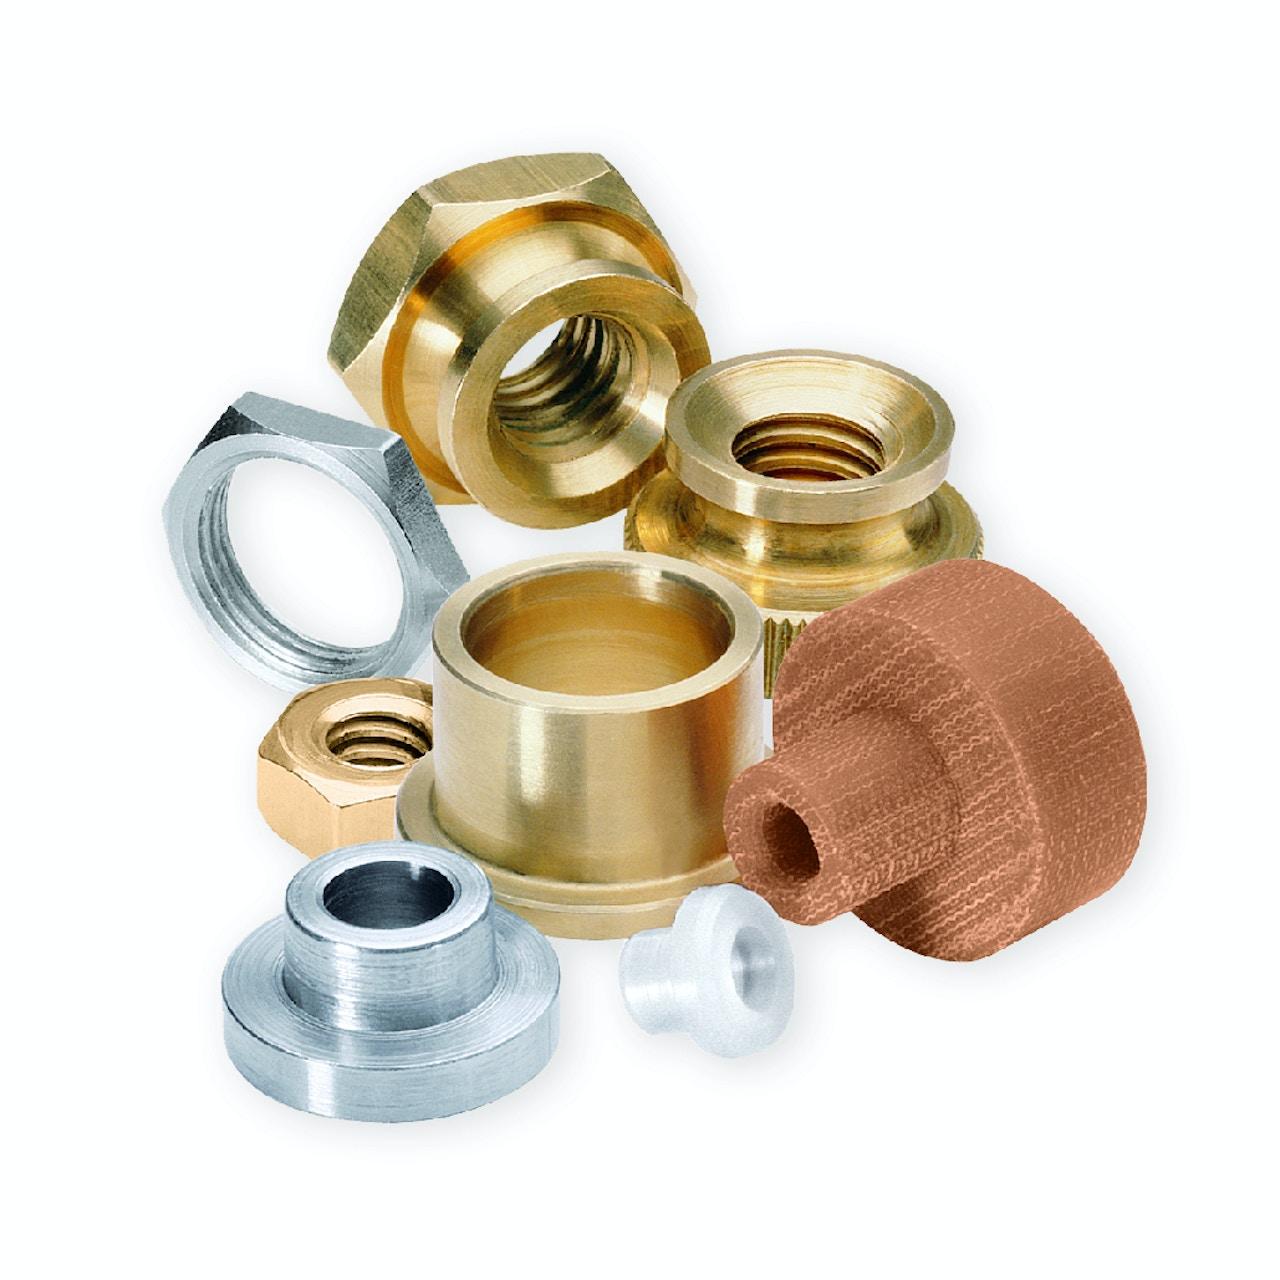 Custom fastener components - Threaded & clear-hole bushings